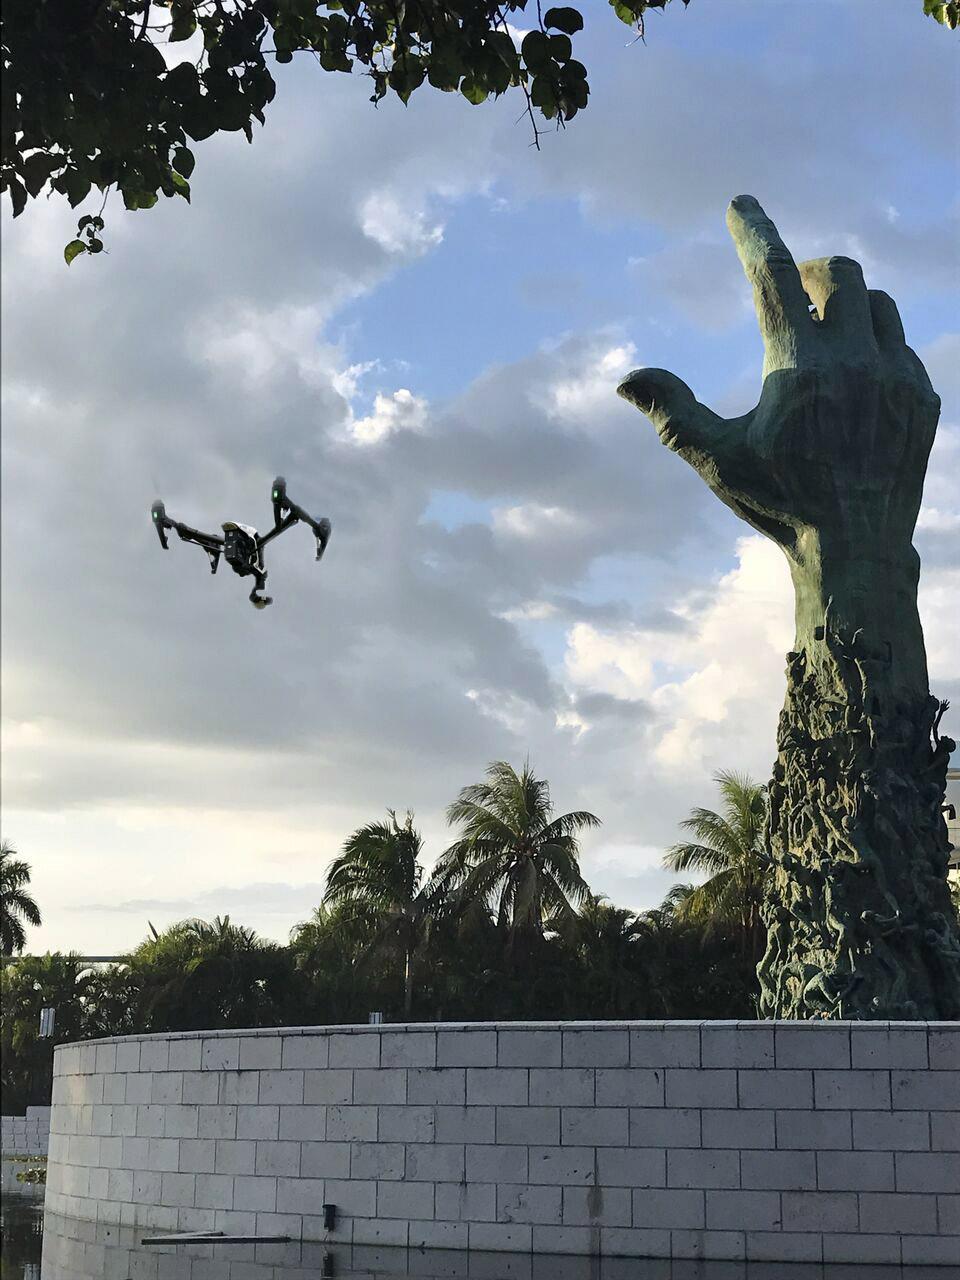 Our drone orbiting architect Ken Treister's landmark sculpture.